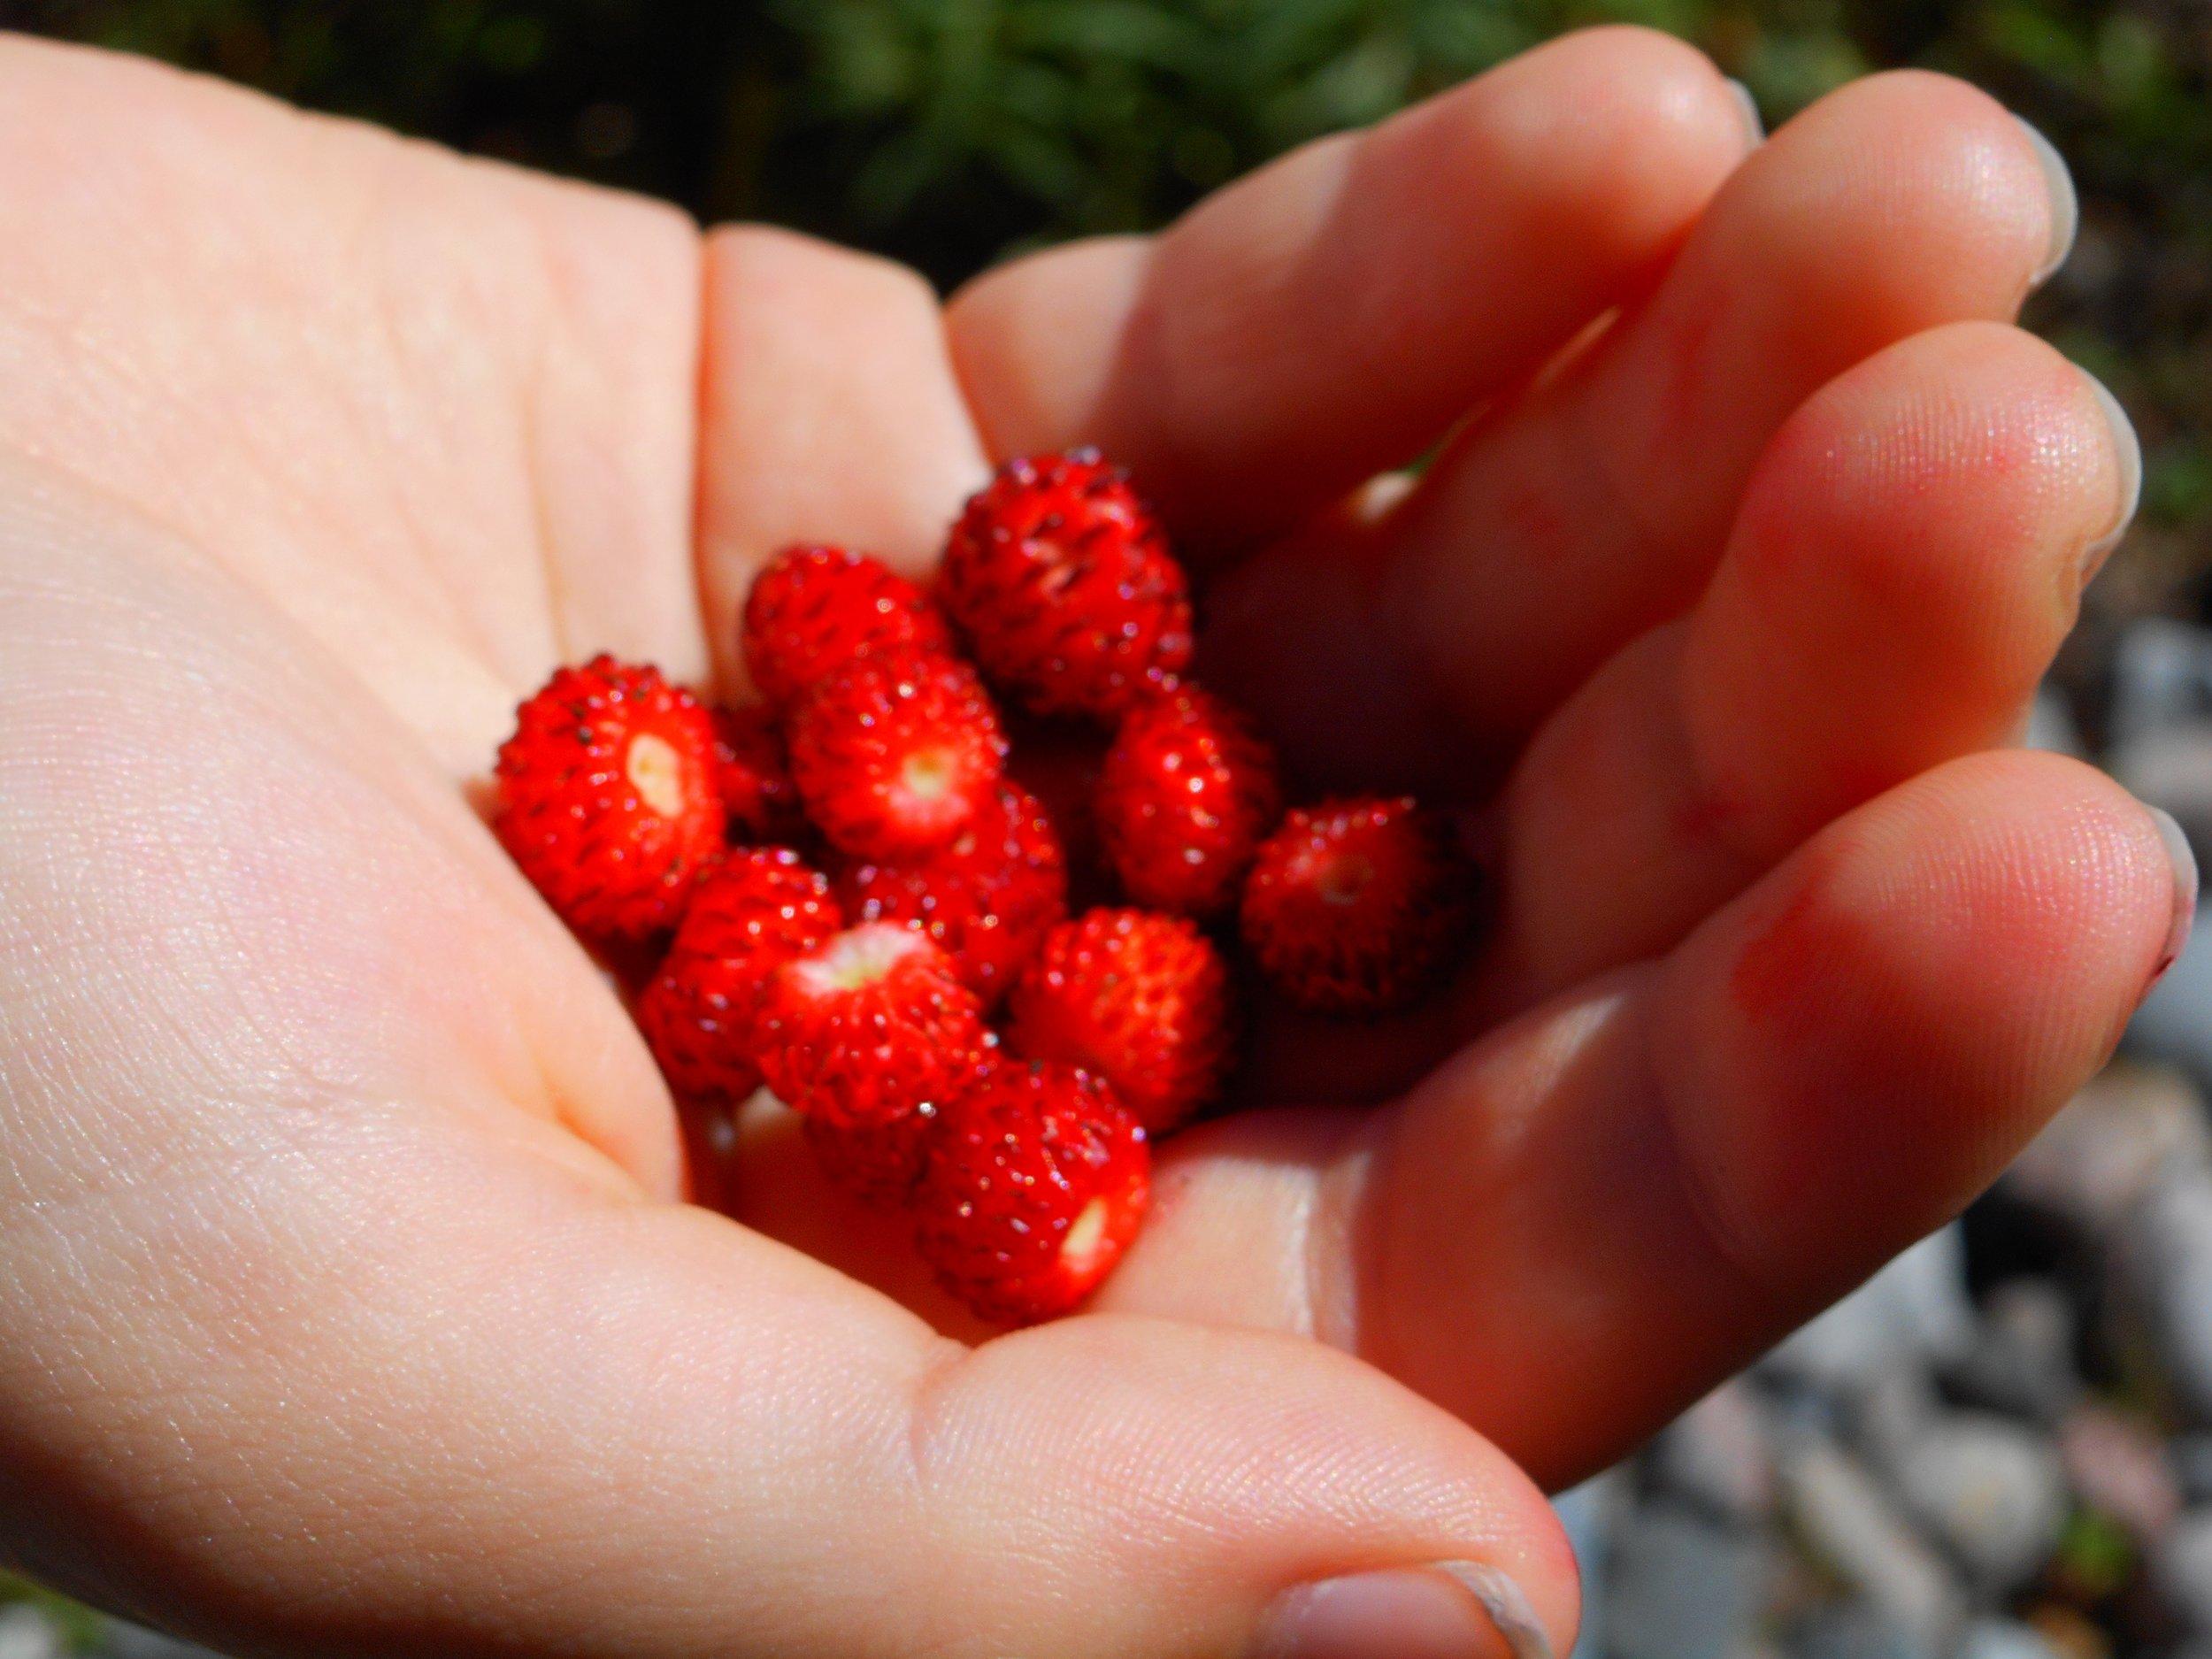 Wild strawberries on hand Nature trip Helsinki